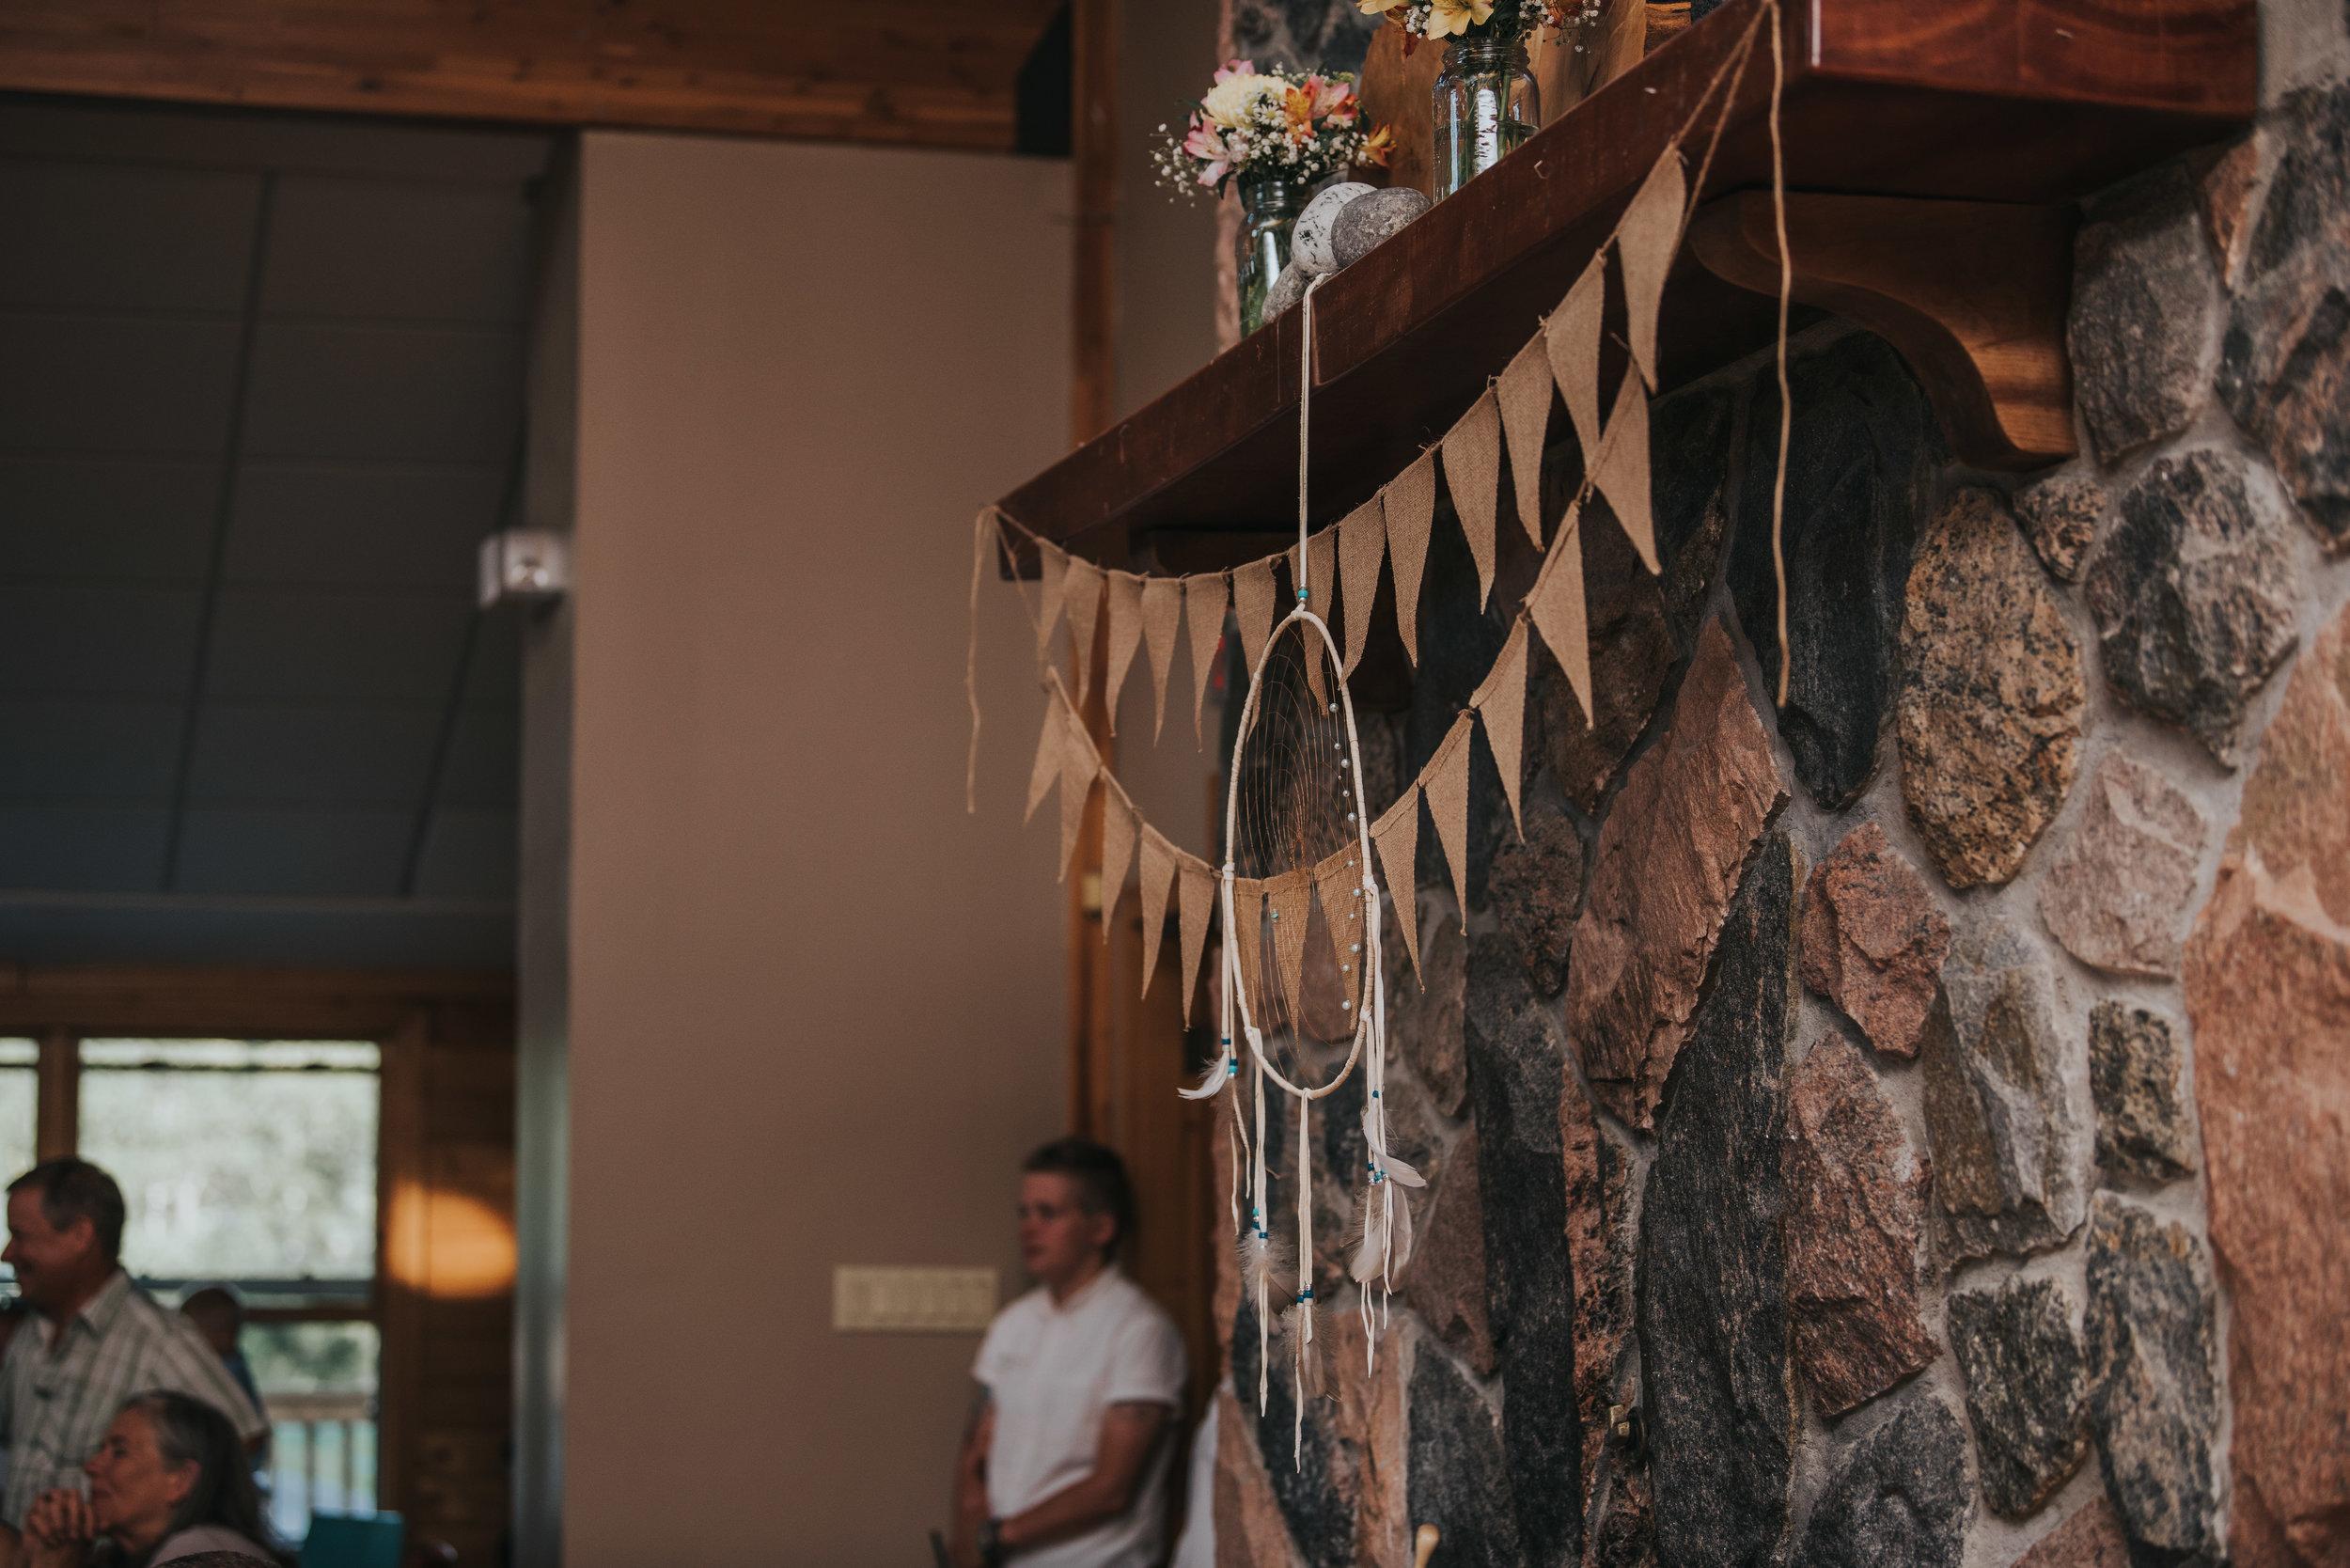 rustic-cabin-wedding-reception-decor-toronto-bohemian-boho-outdoor-summer-wedding-documentary-wedding-photography-by-willow-birch-photo.jpg